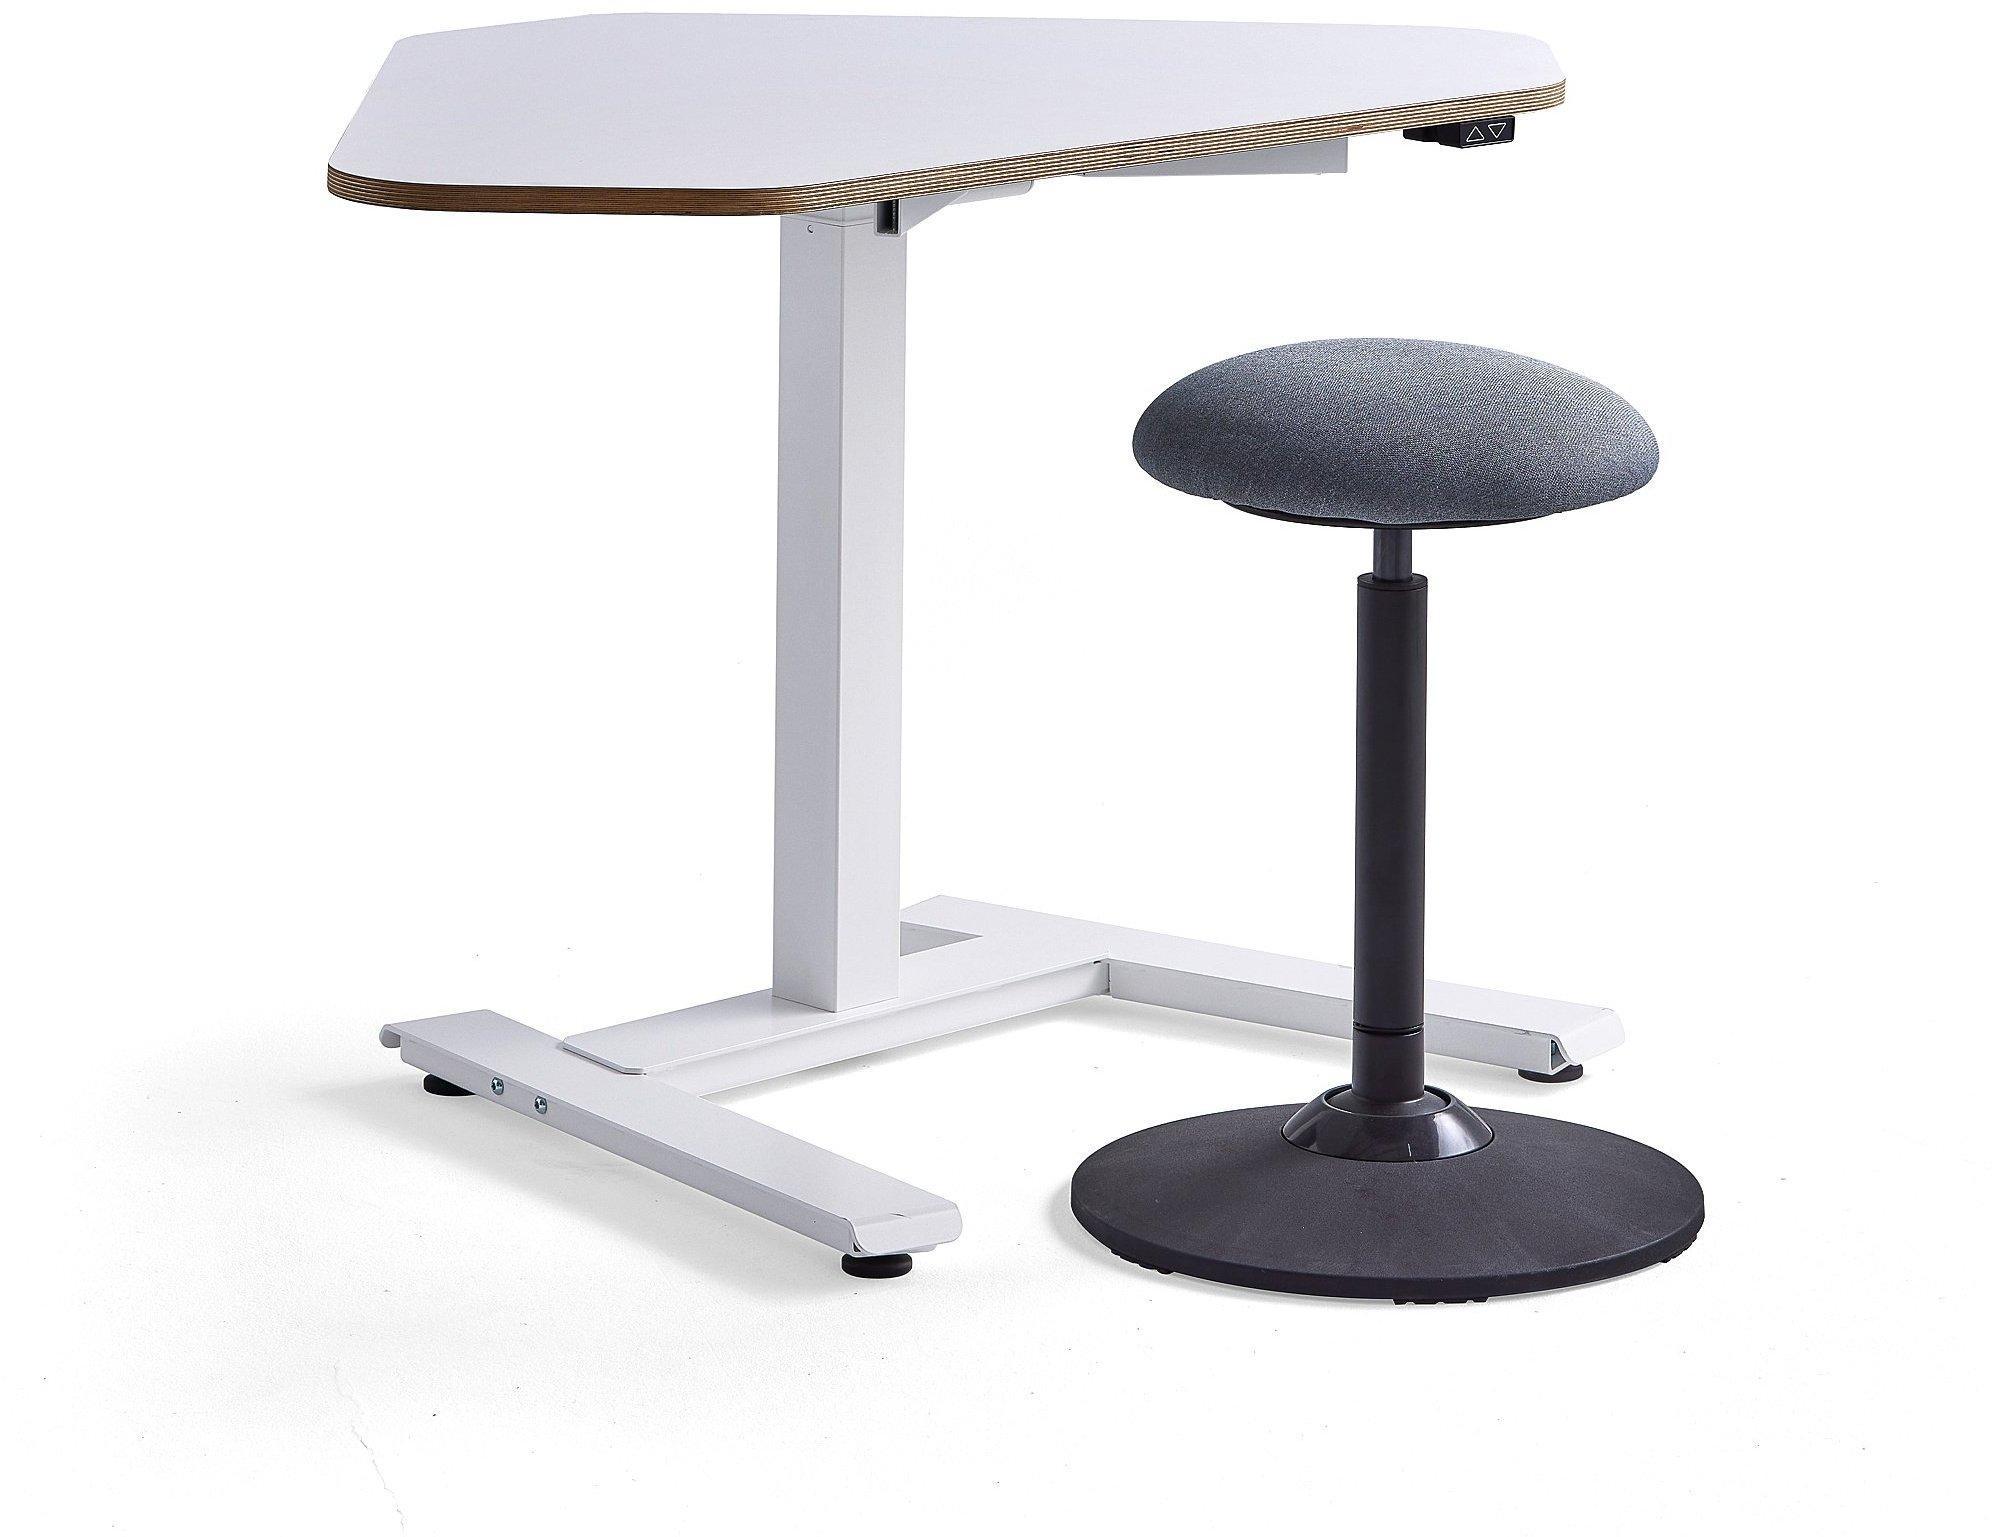 Zostava nábytku: 1 biely rohový stôl Novus + 1 stolička Acton